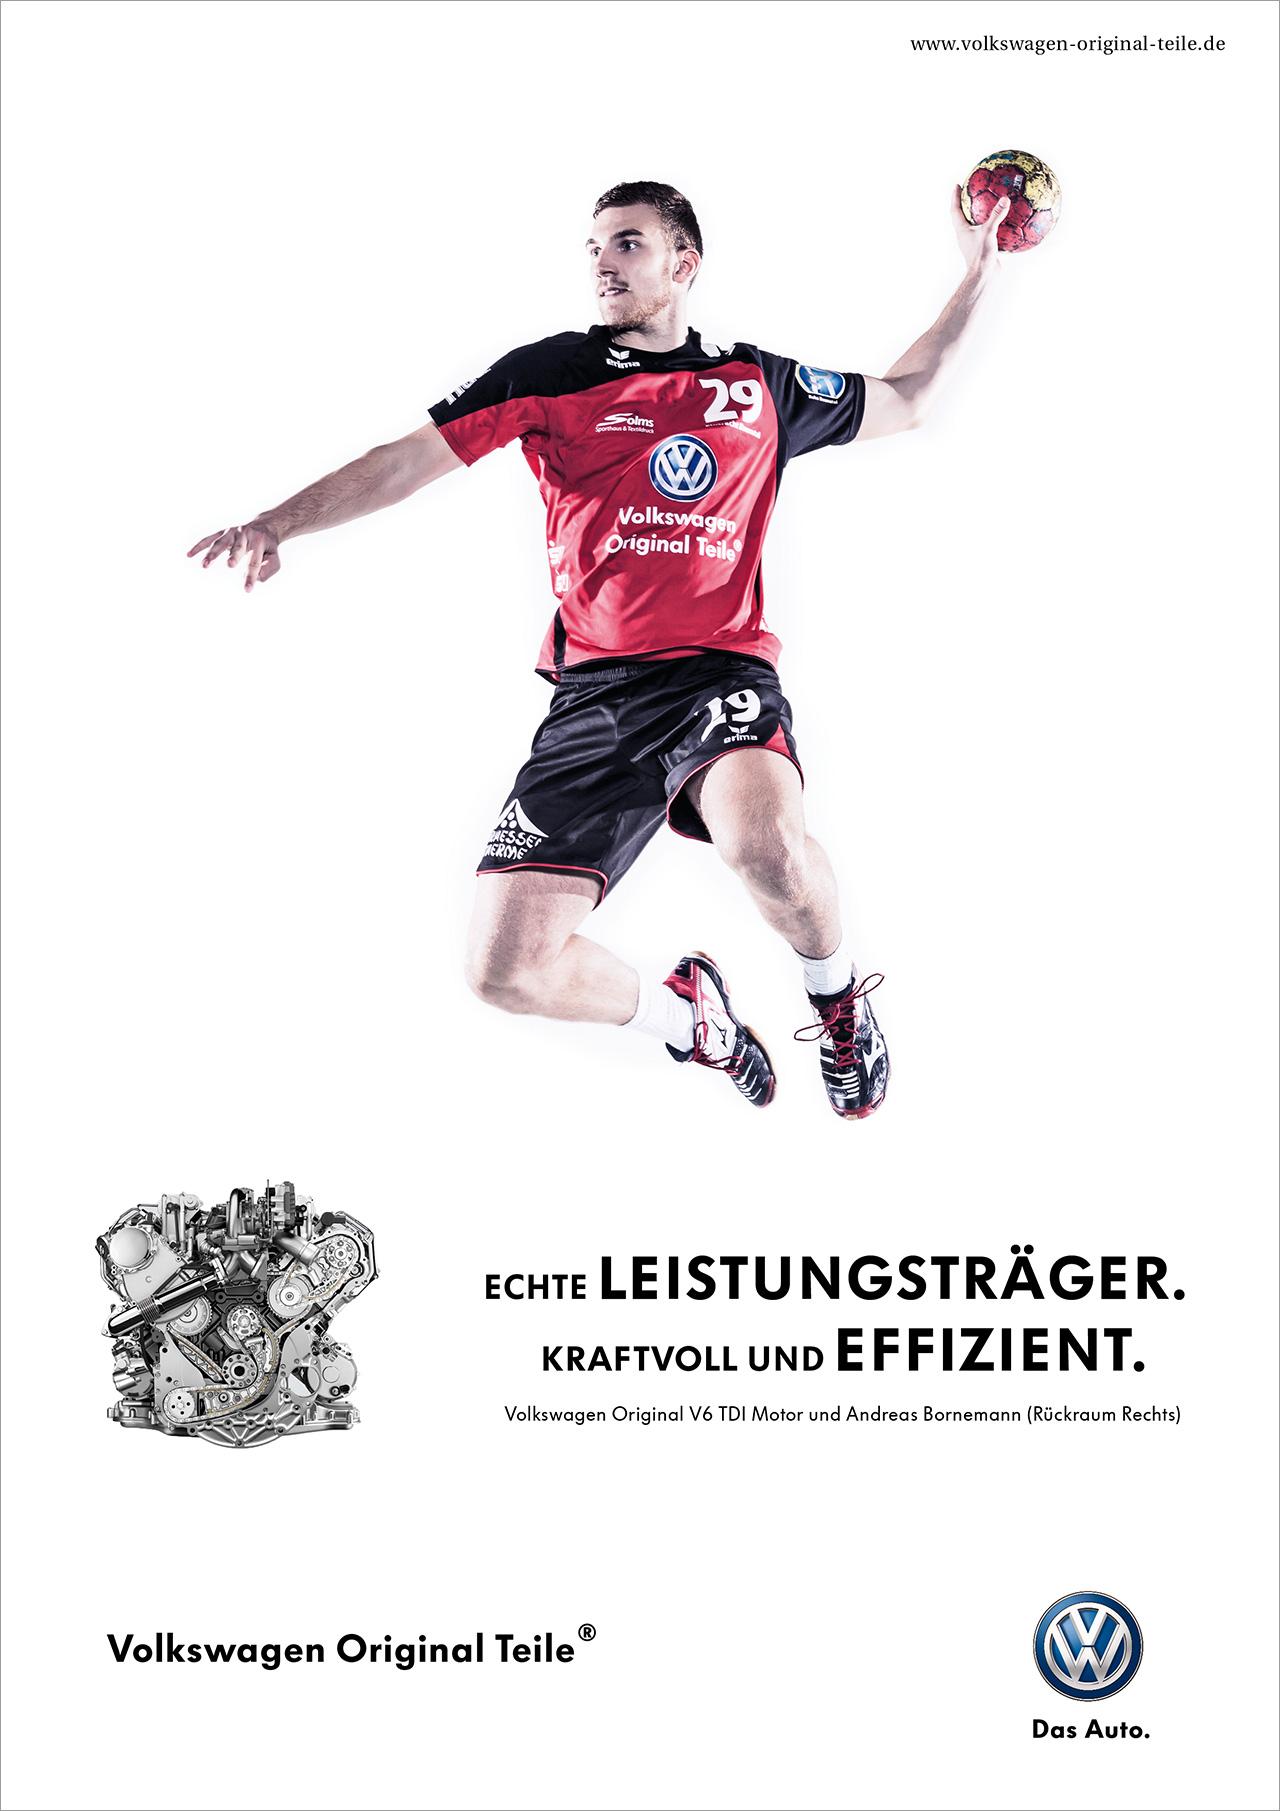 intonic werbeagentur vw sportsponsoring handball anzeige